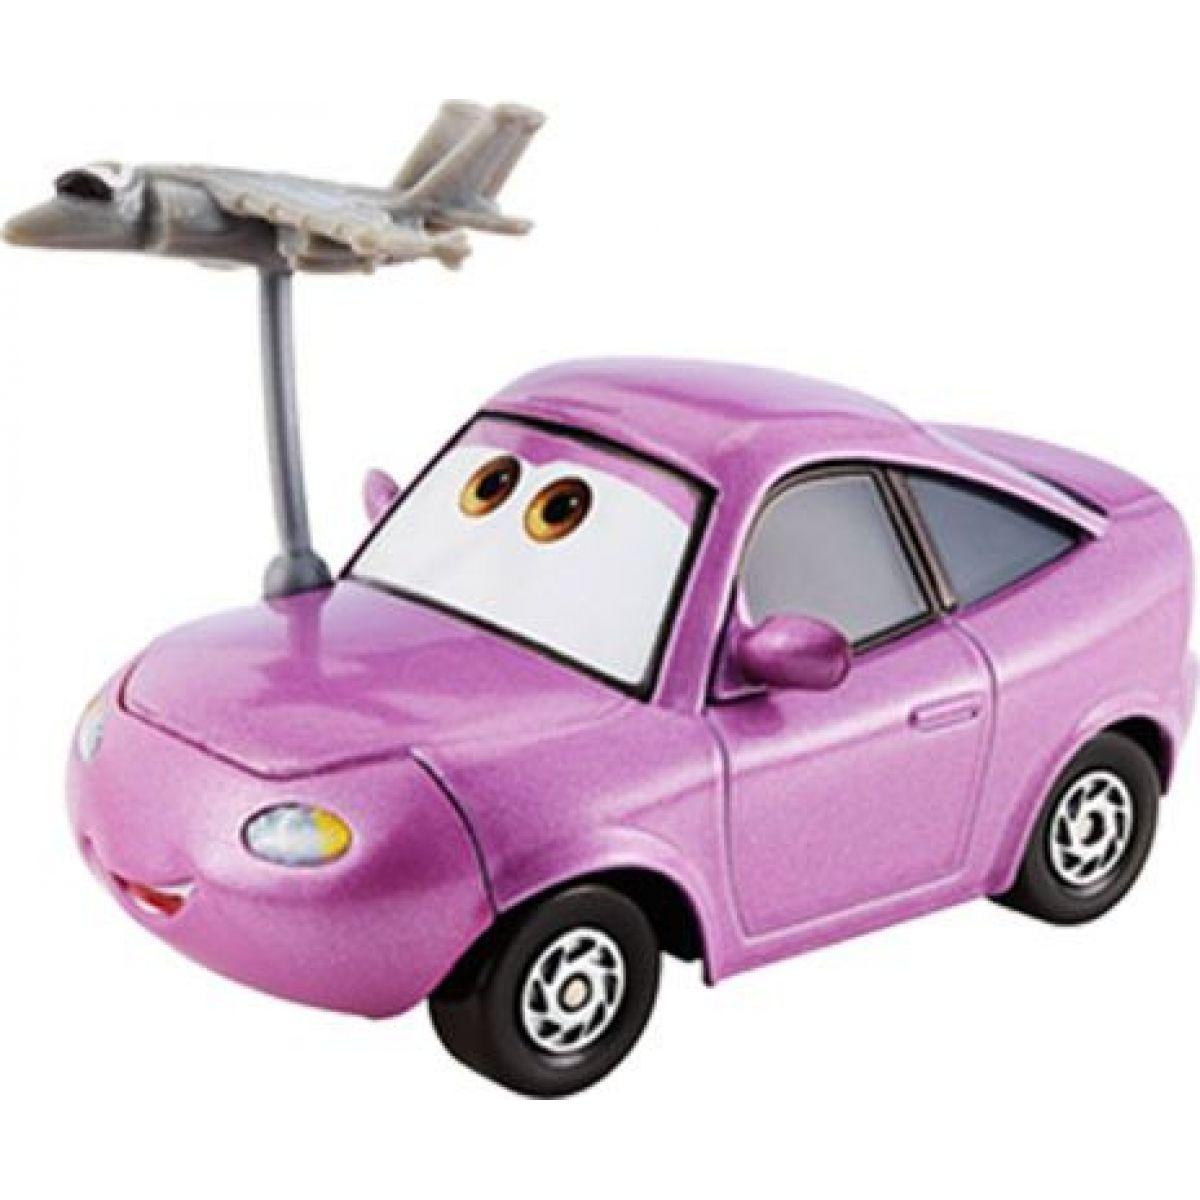 Cars 2 Auta Mattel W1938 - Coriander Widetrack